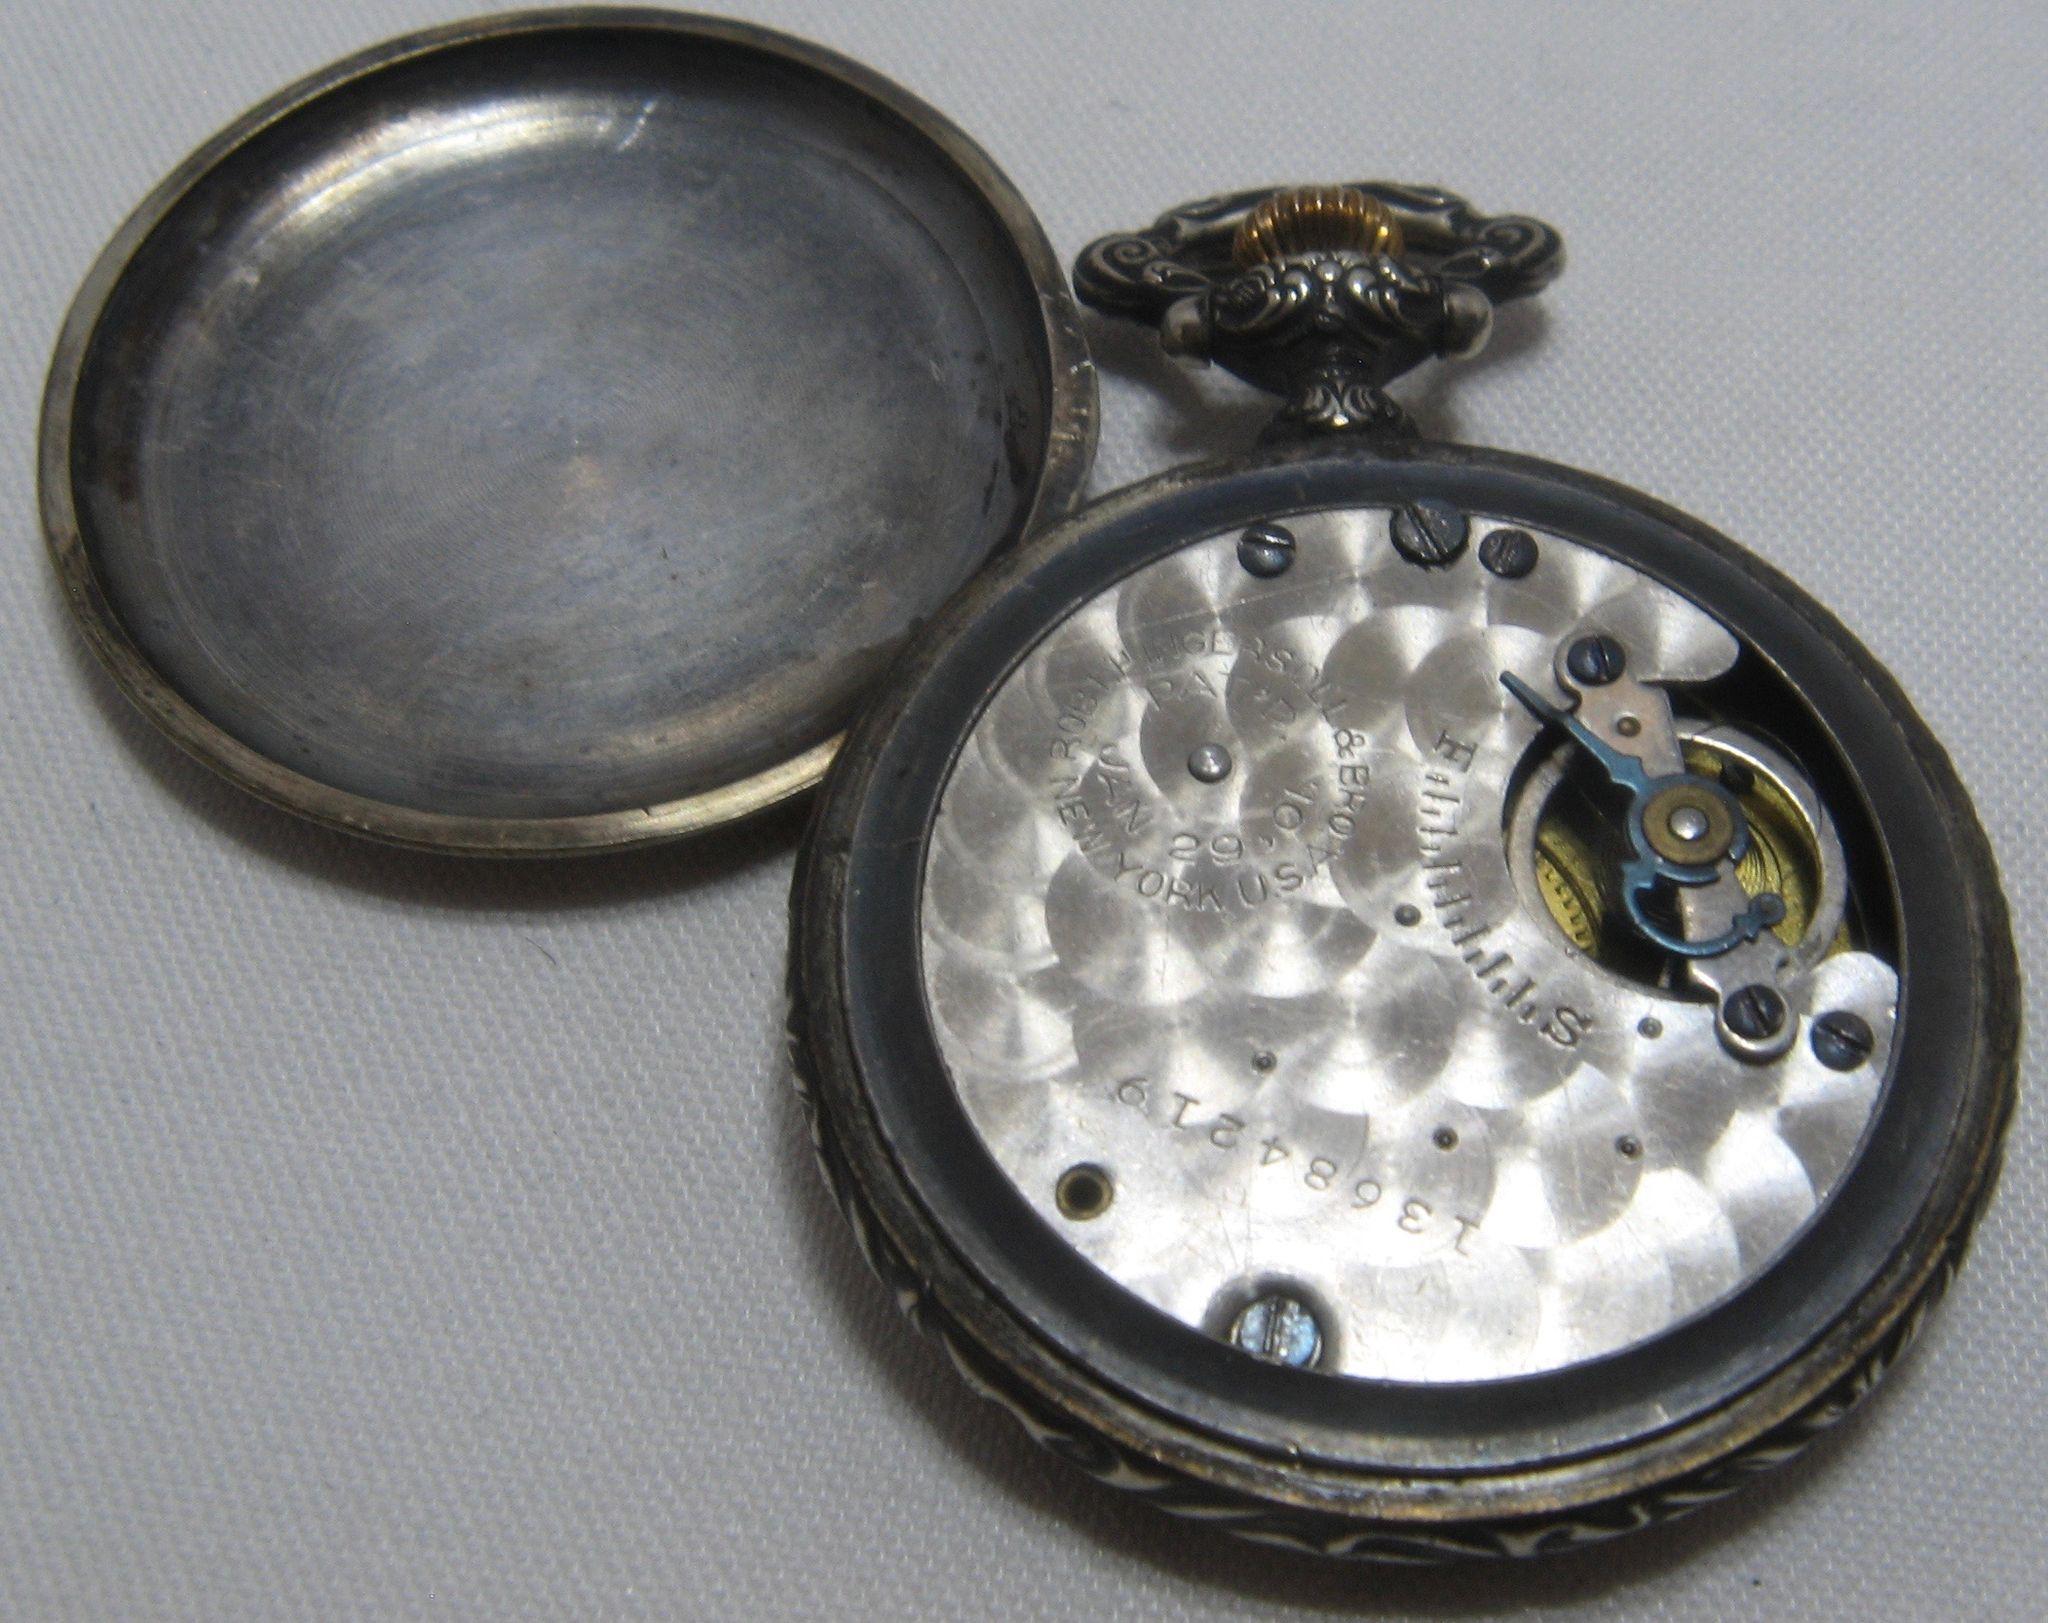 Ingersoll midget pocket watch